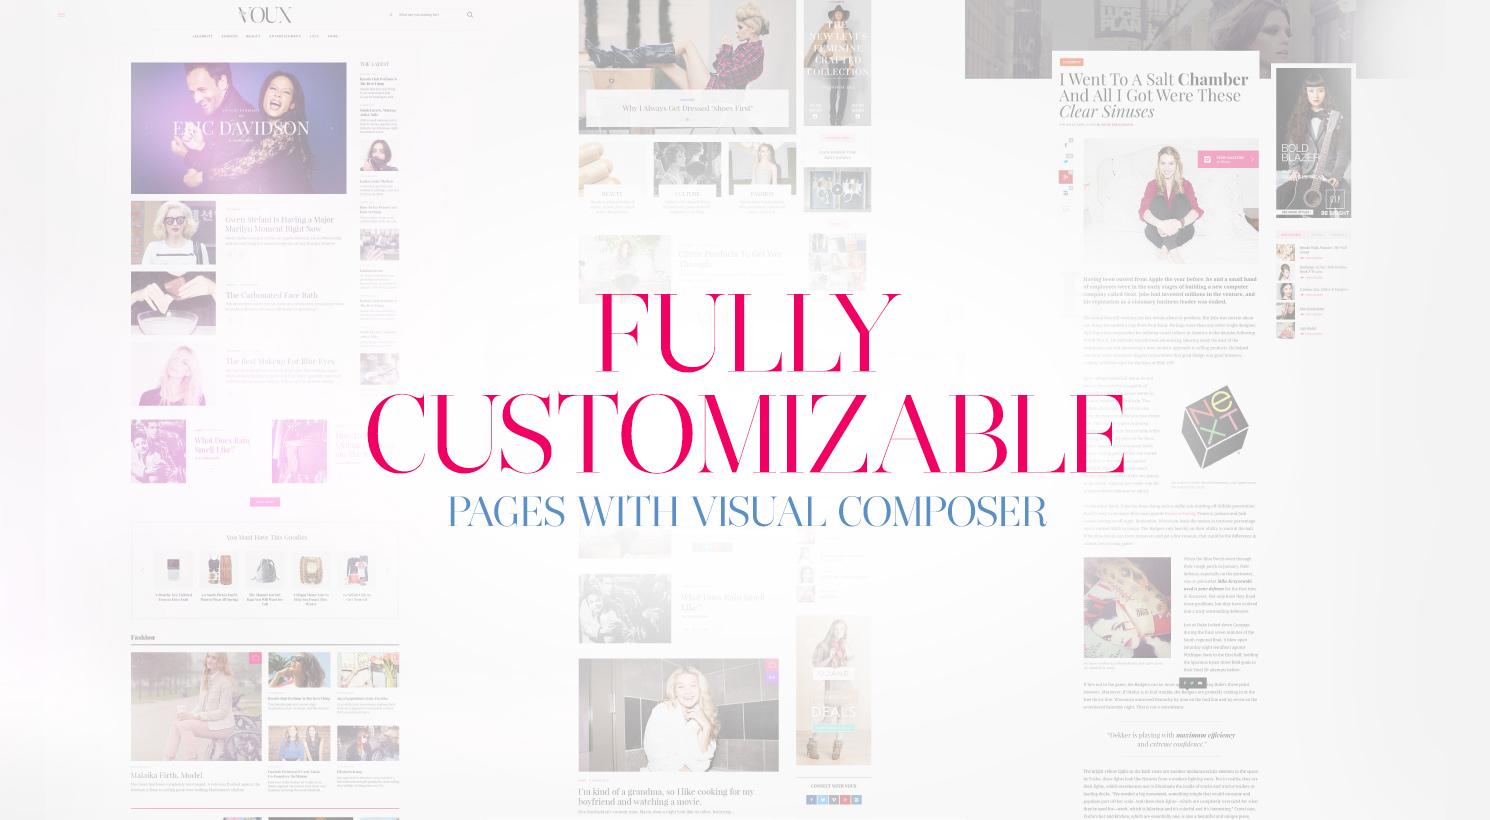 The Voux - A Comprehensive Magazine Theme